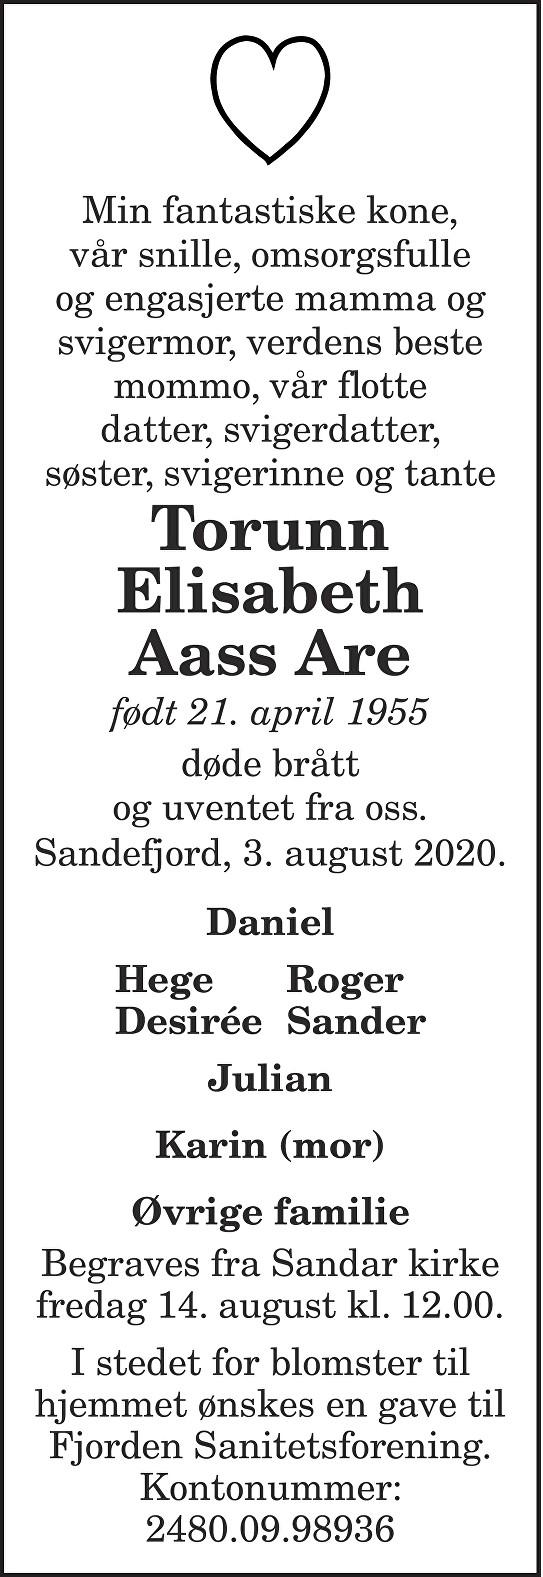 Torunn Elisabeth Aass Are Dødsannonse